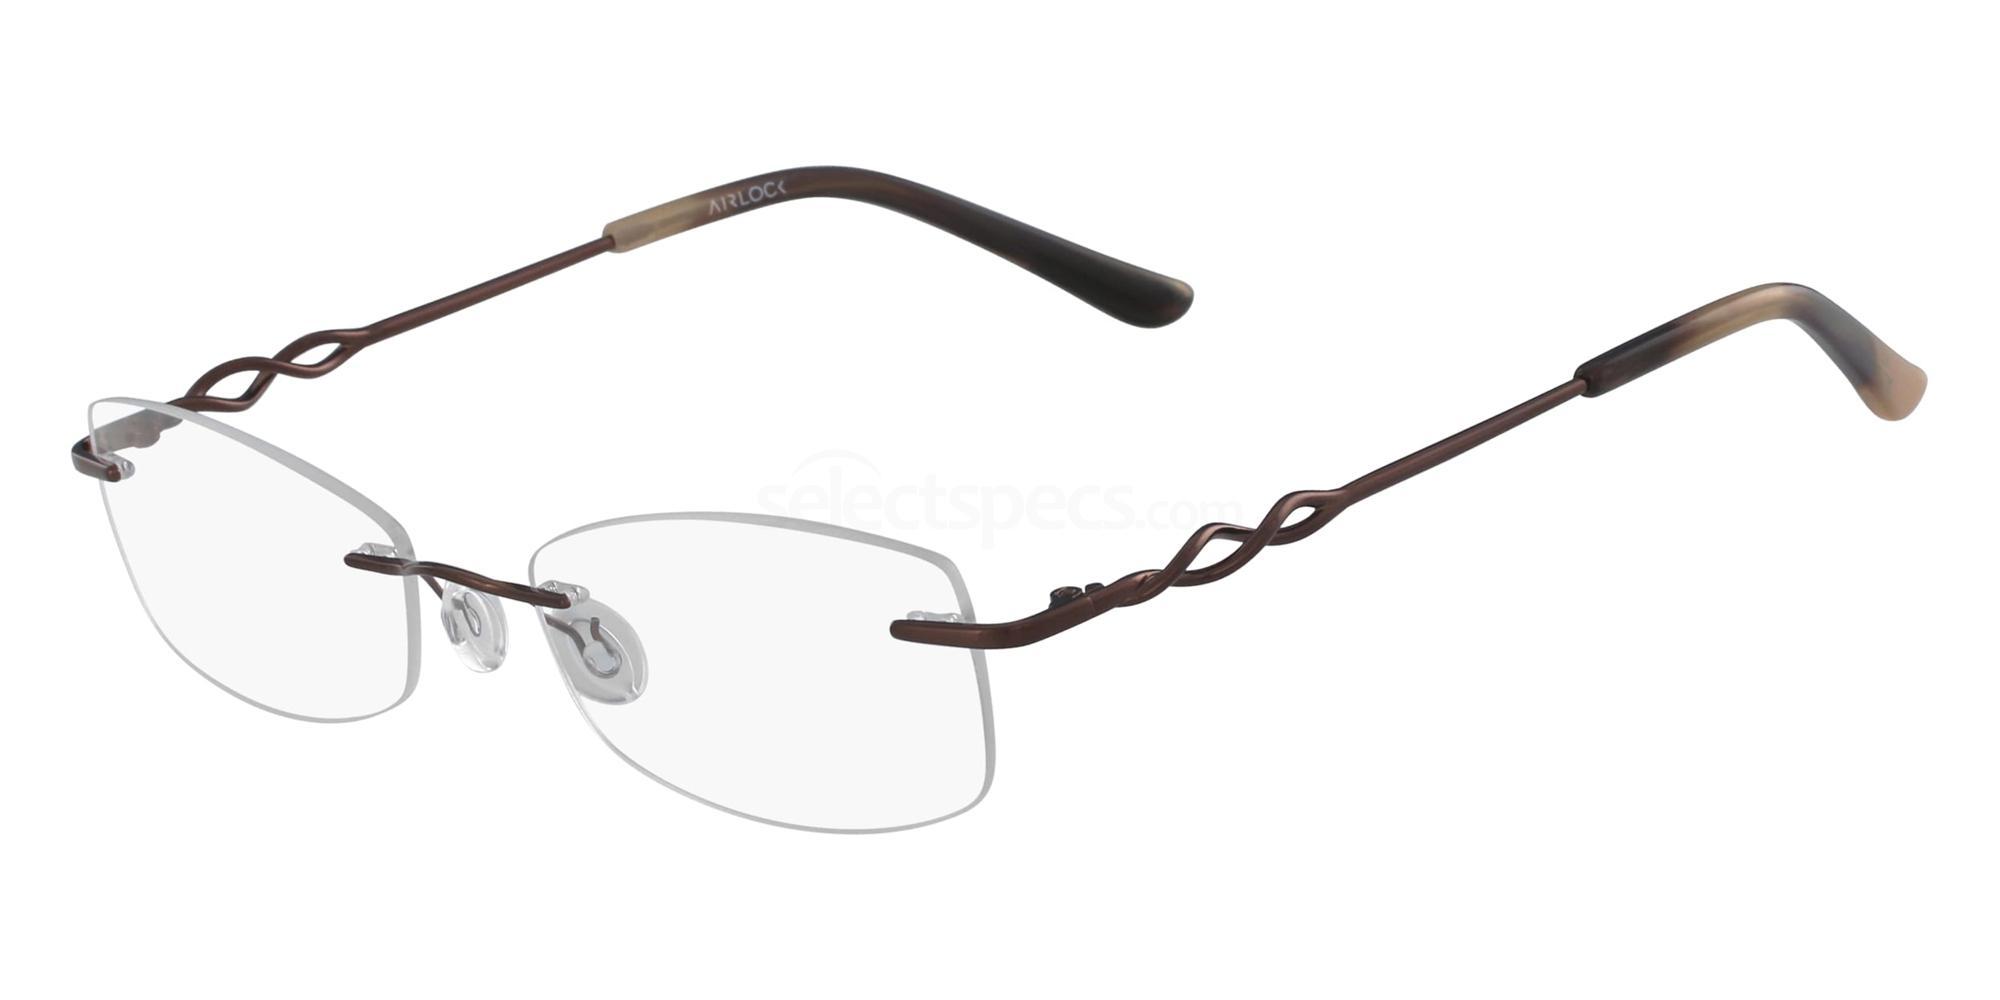 210 ESSENCE 200 Glasses, AIRLOCK